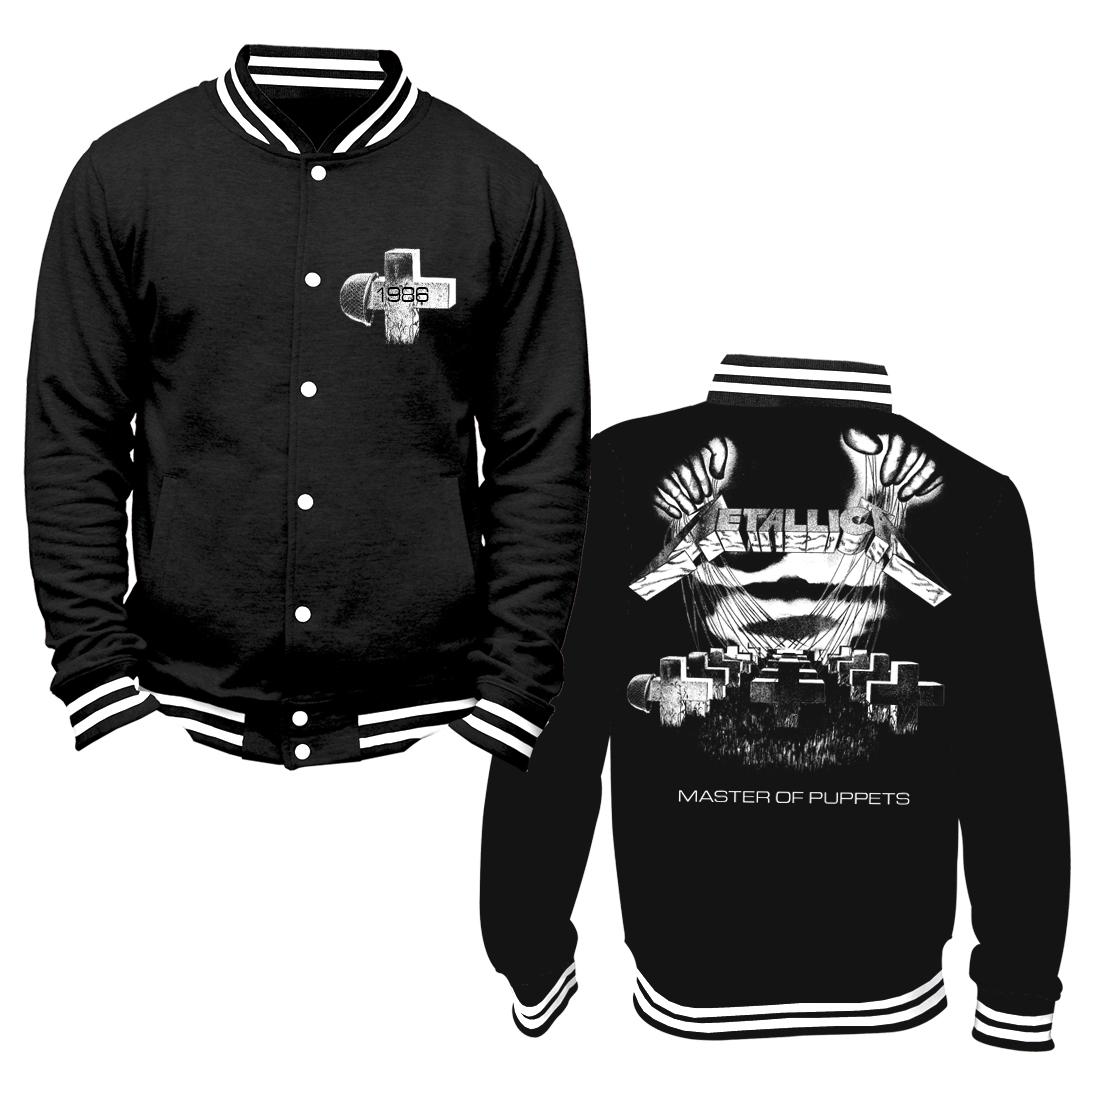 MOP Distressed – Black College Jacket